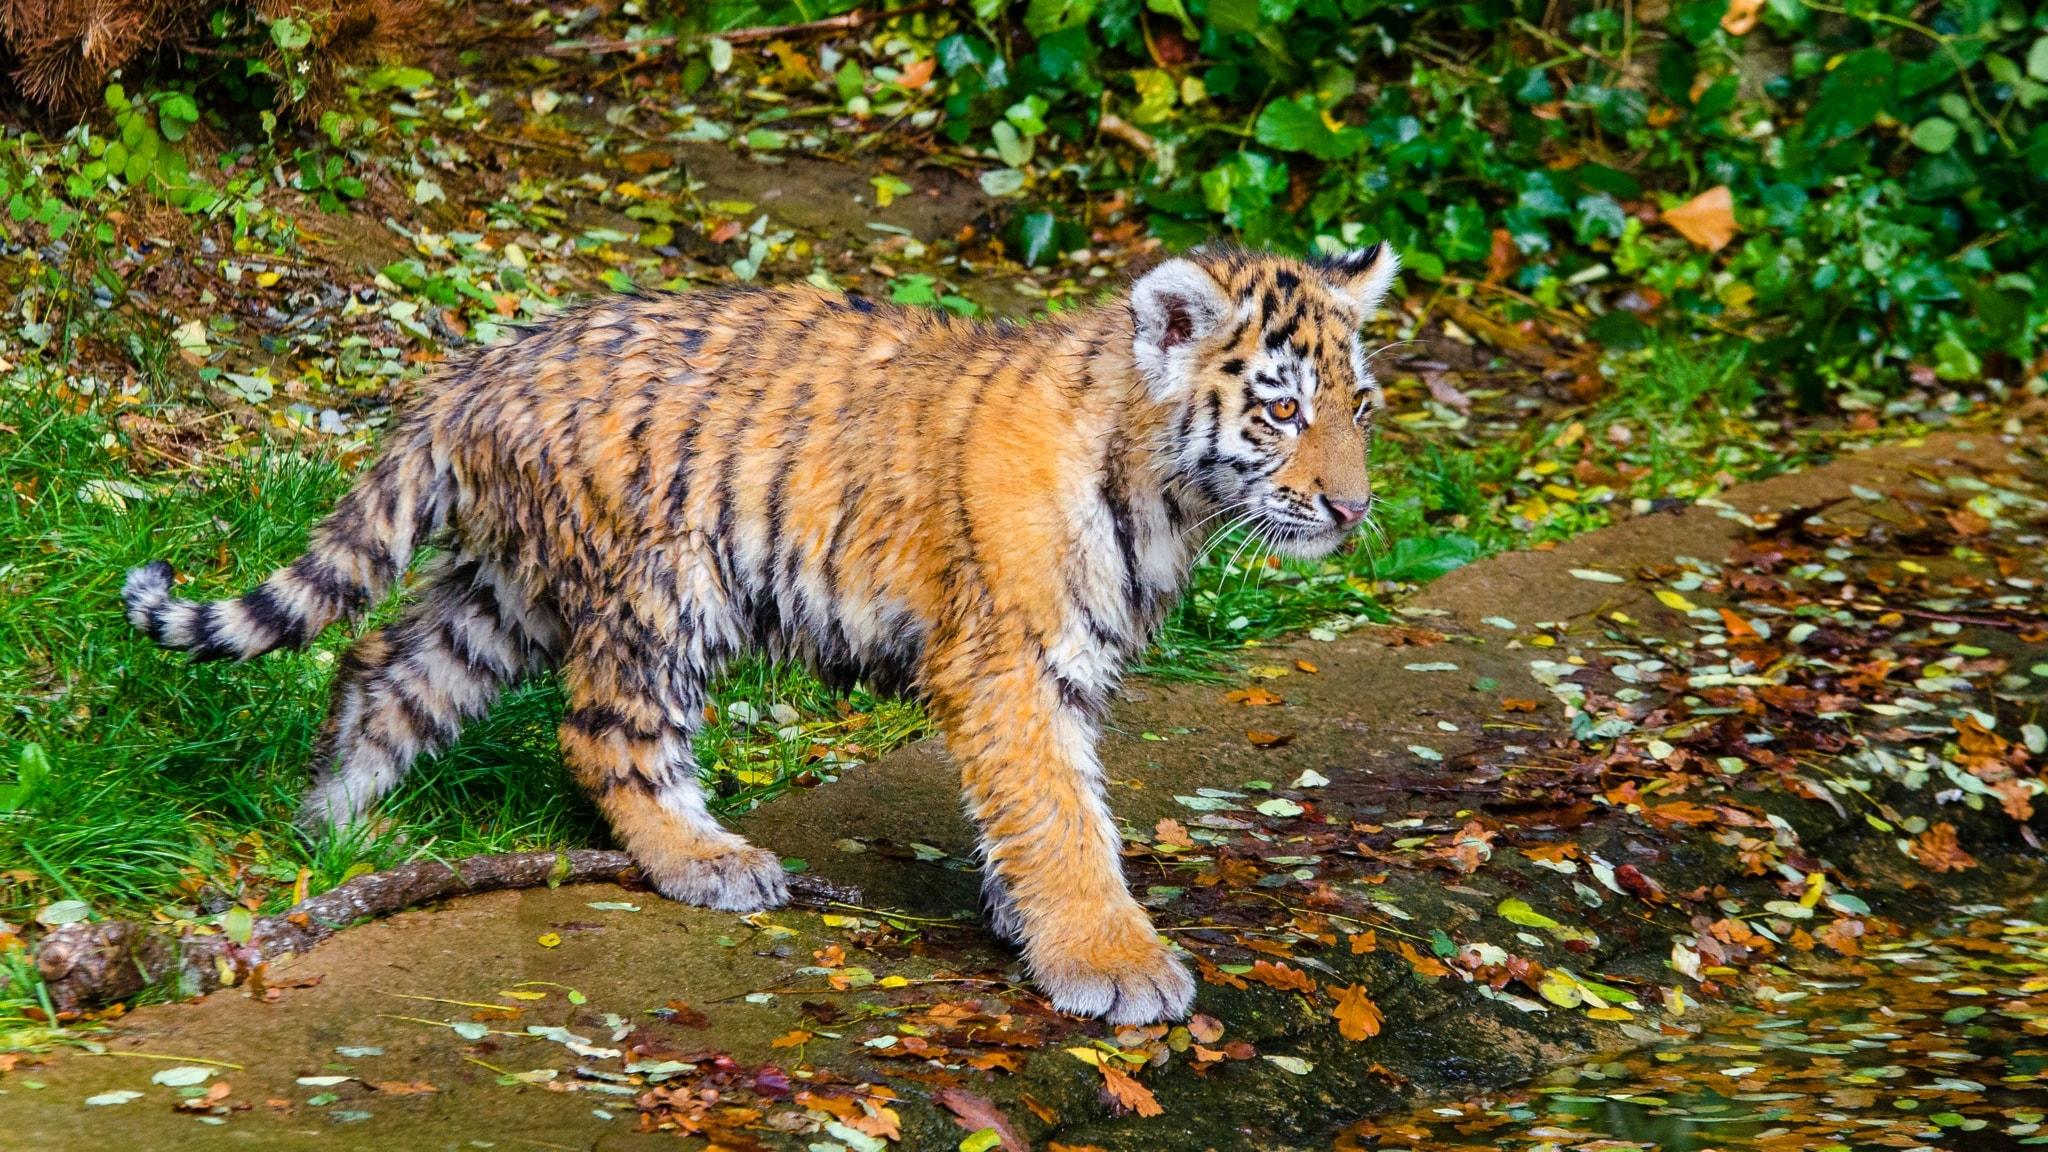 Satu: Tiikeri